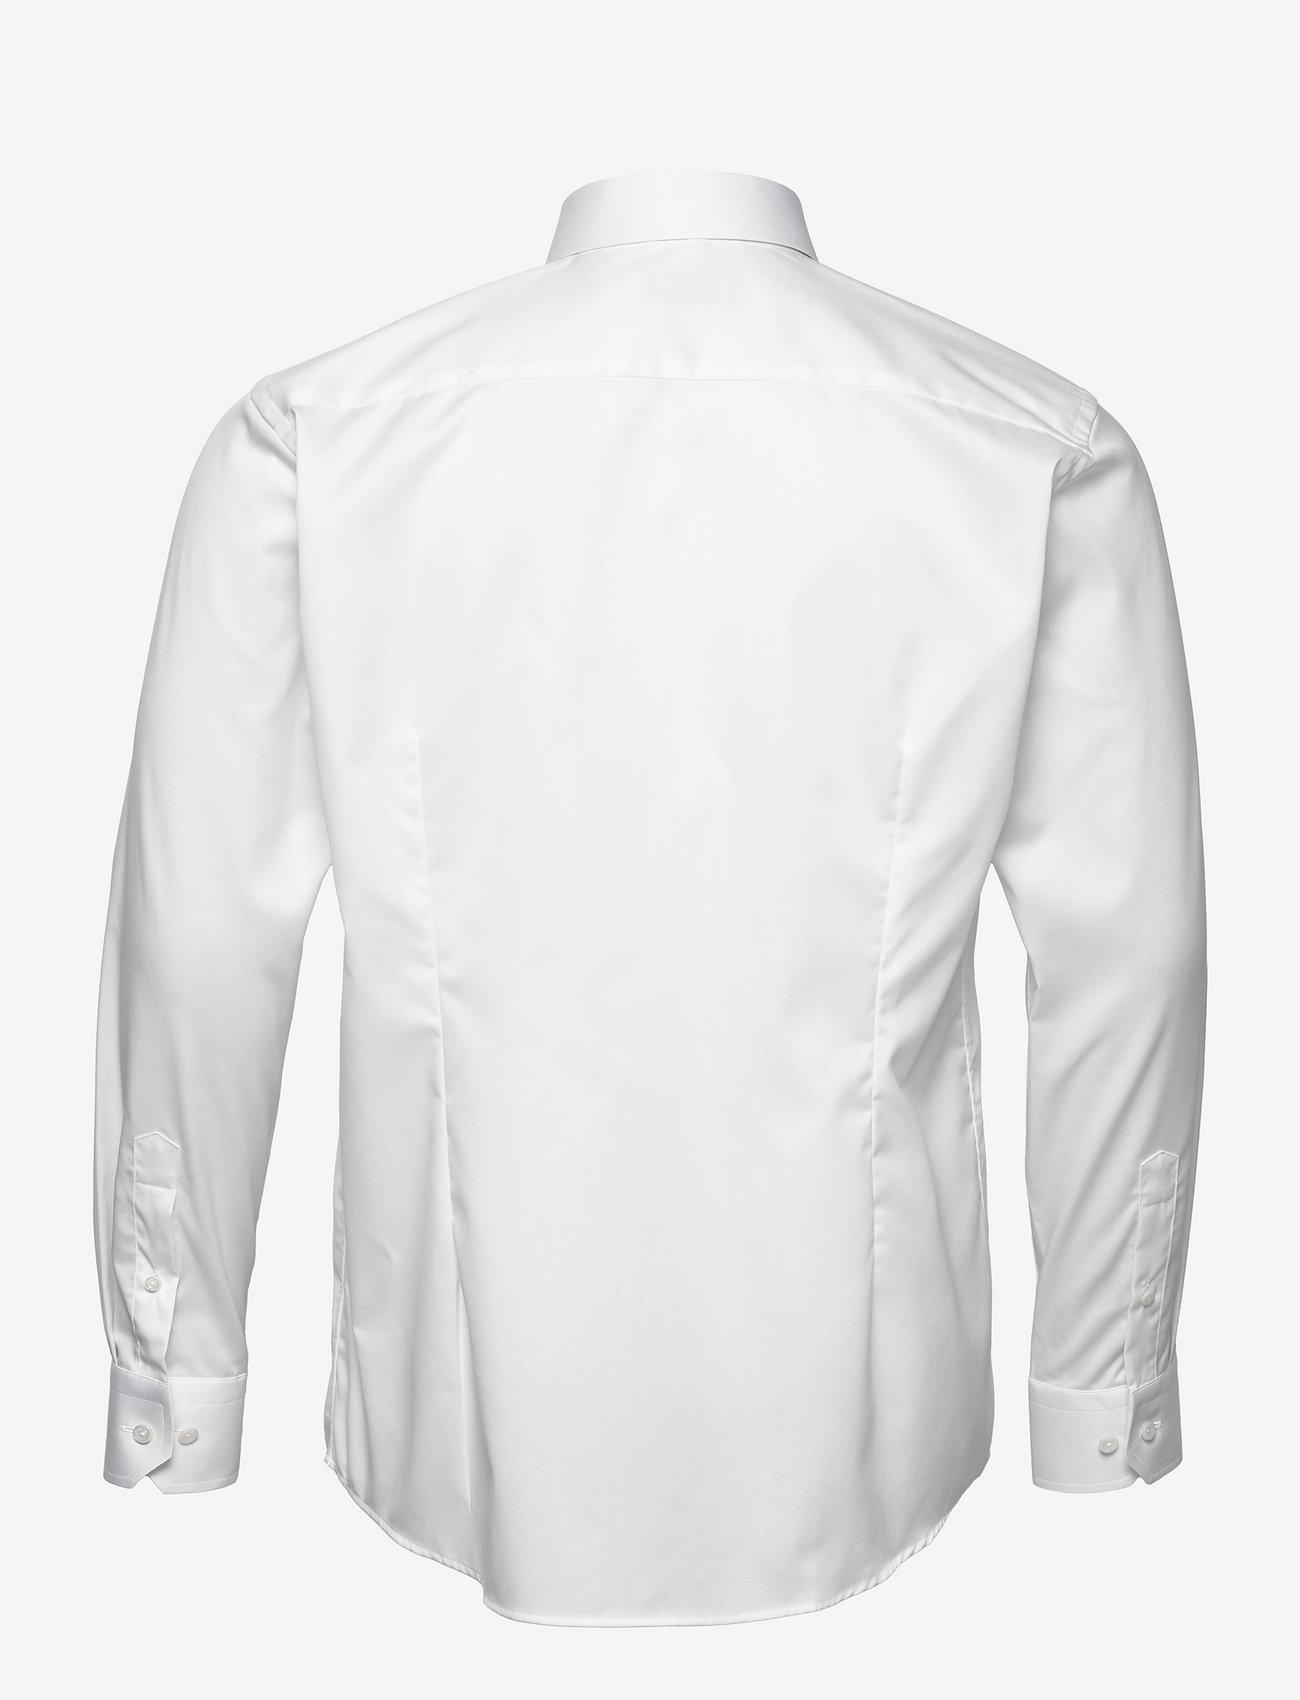 Eton - Cambridge-Collection-Contemporary fit - lina krekli - white - 1